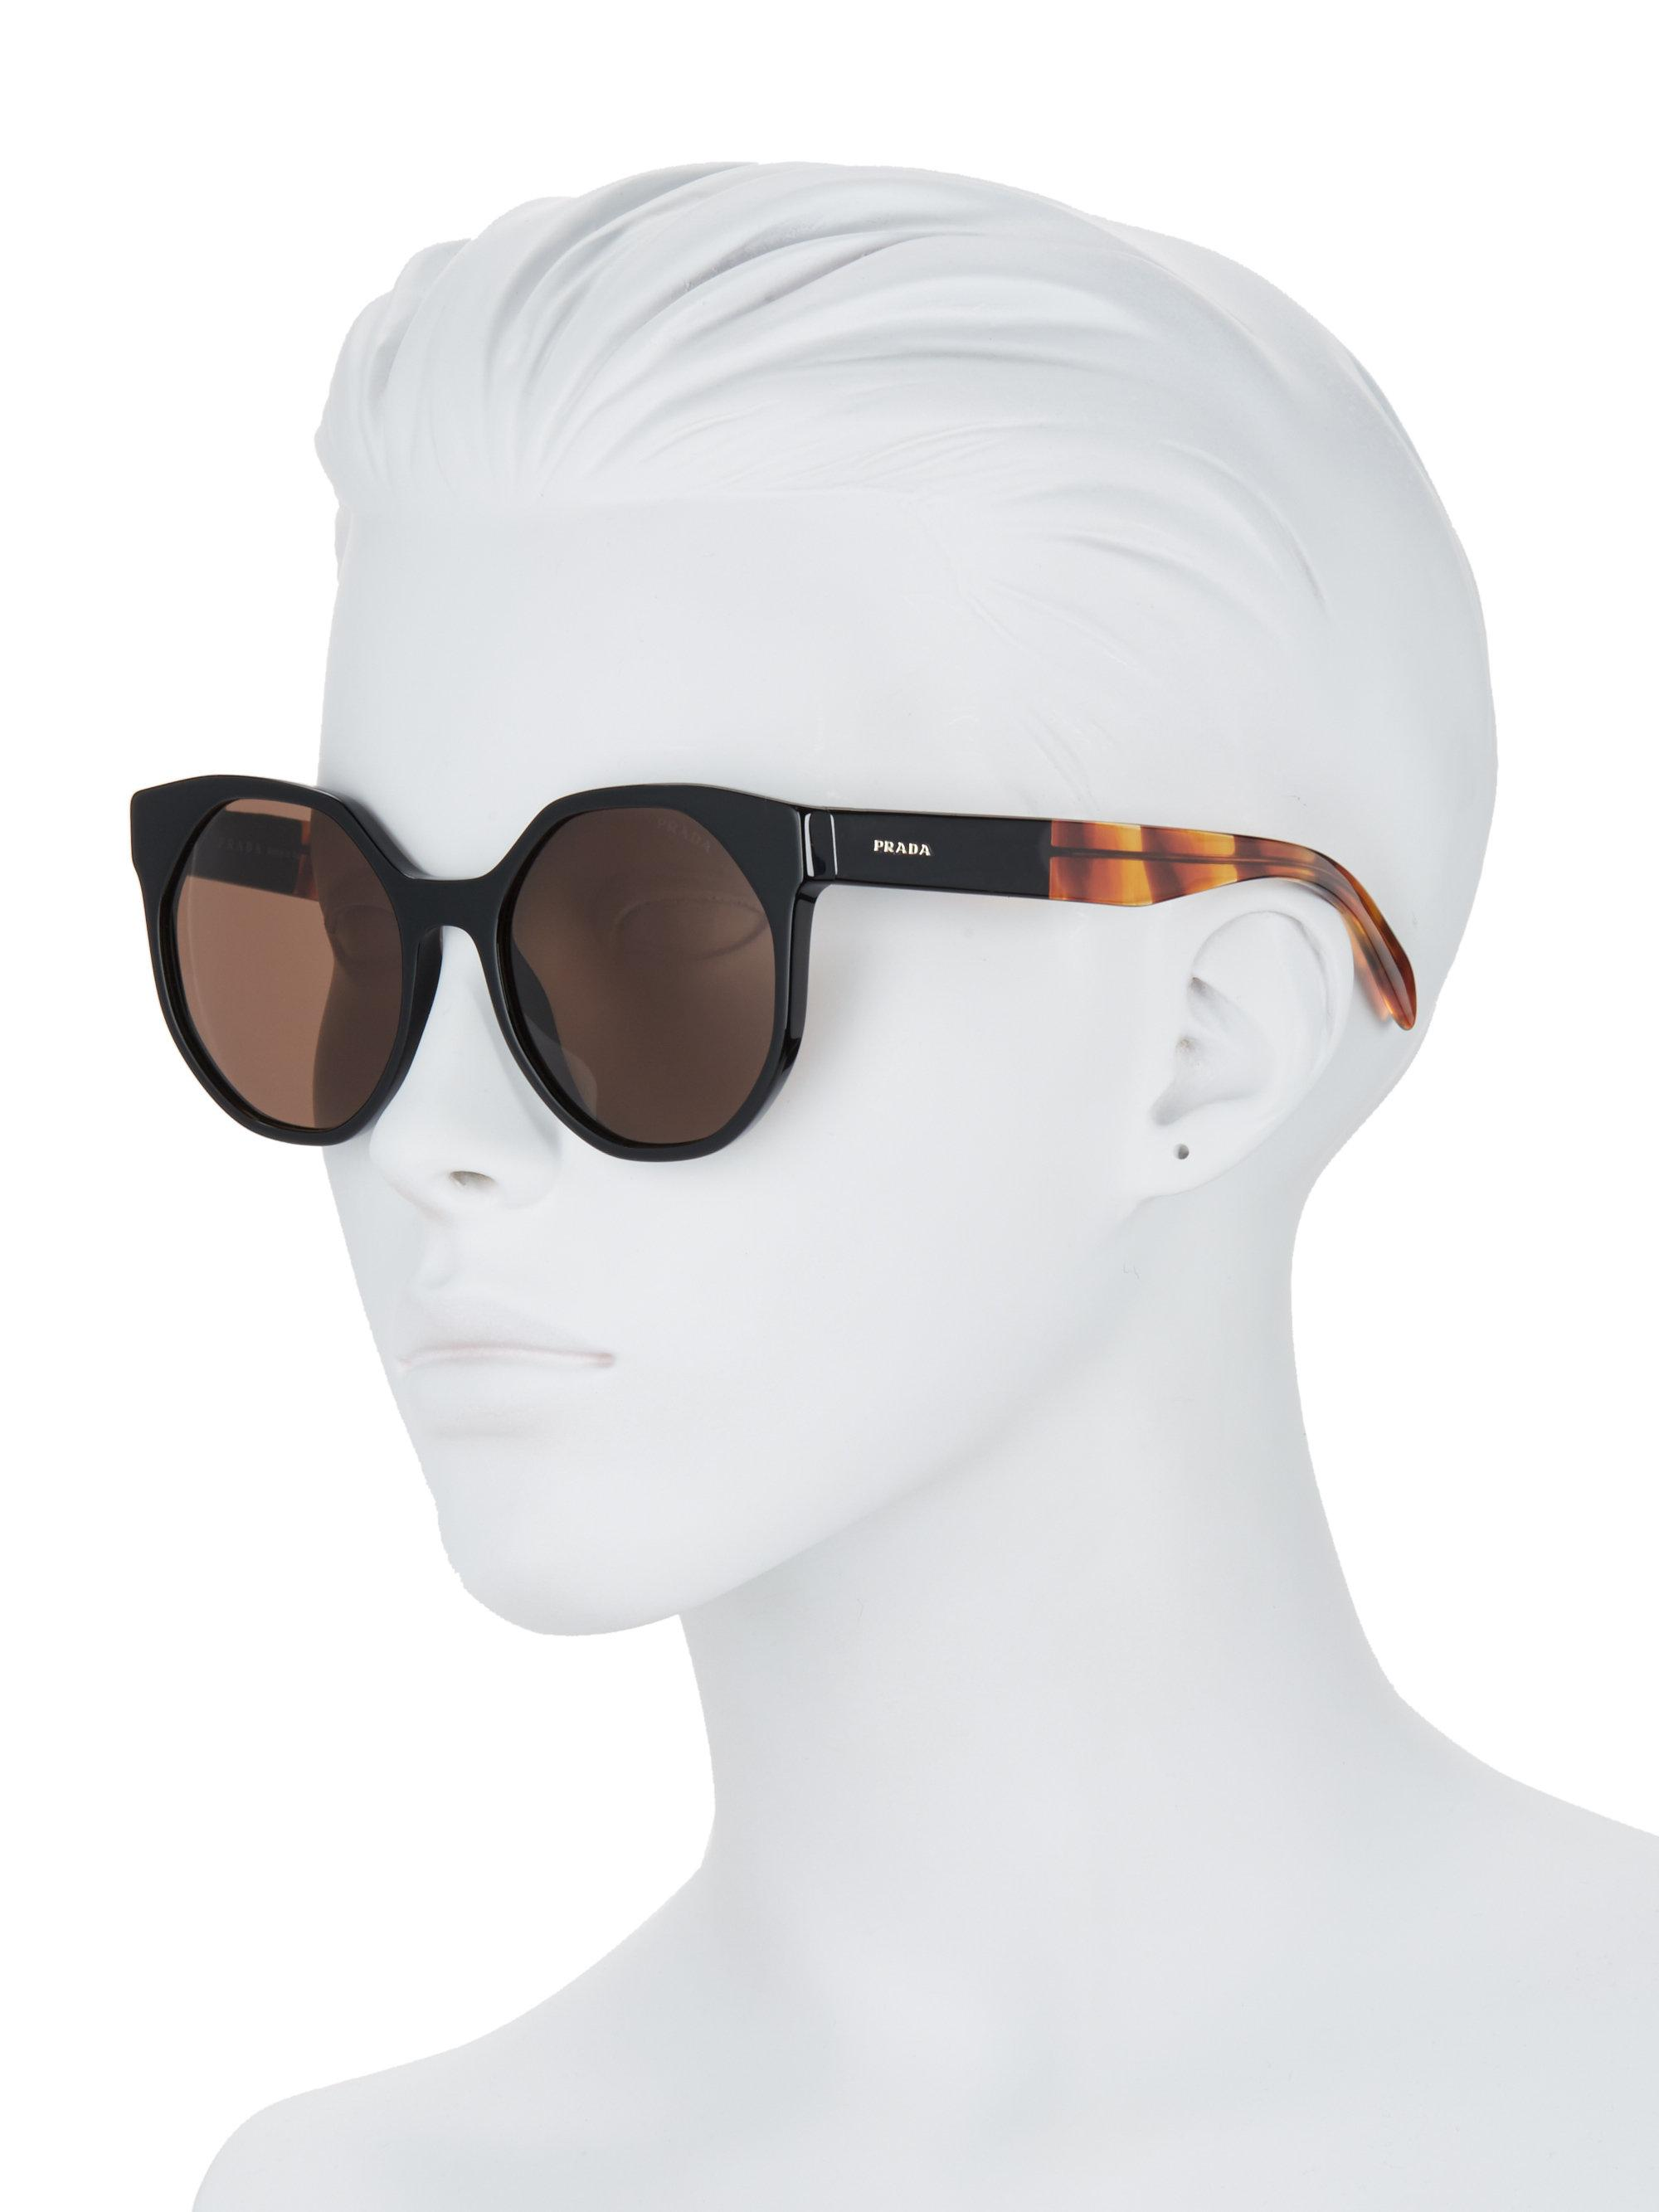 fc460e8503f ... usa prada multicolor 55mm round cat eye sunglasses lyst. view  fullscreen 46562 405db ...